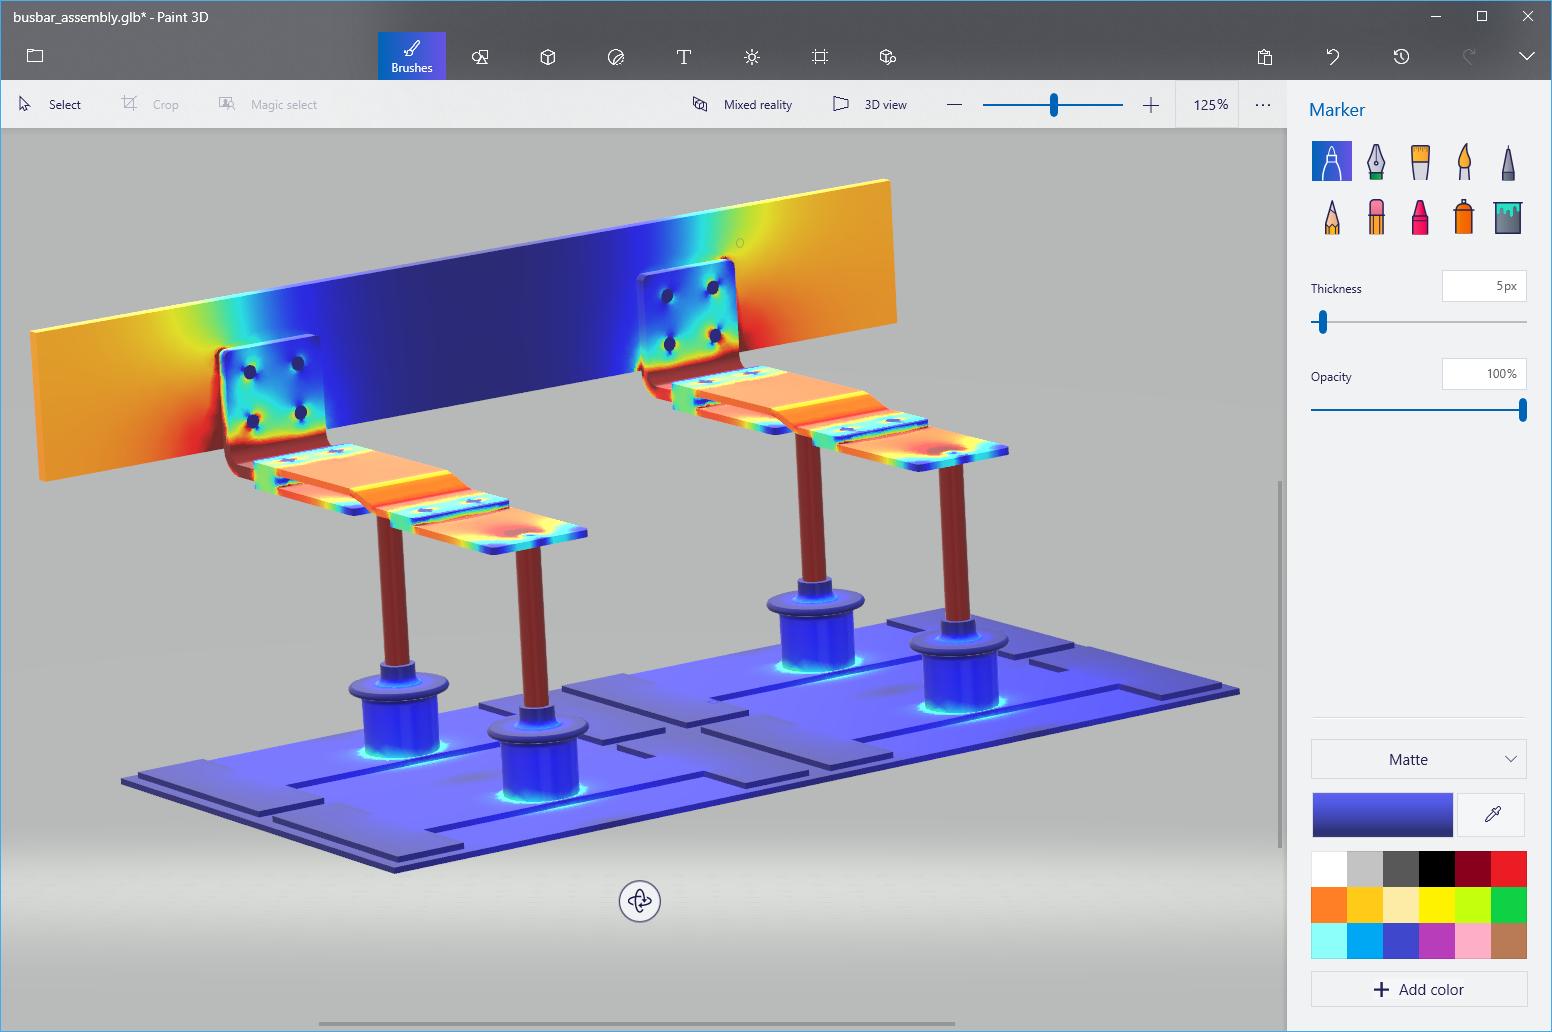 COMSOL Multiphysics 模型导出为 glTF 文件并导入到 Paint 3D 中。